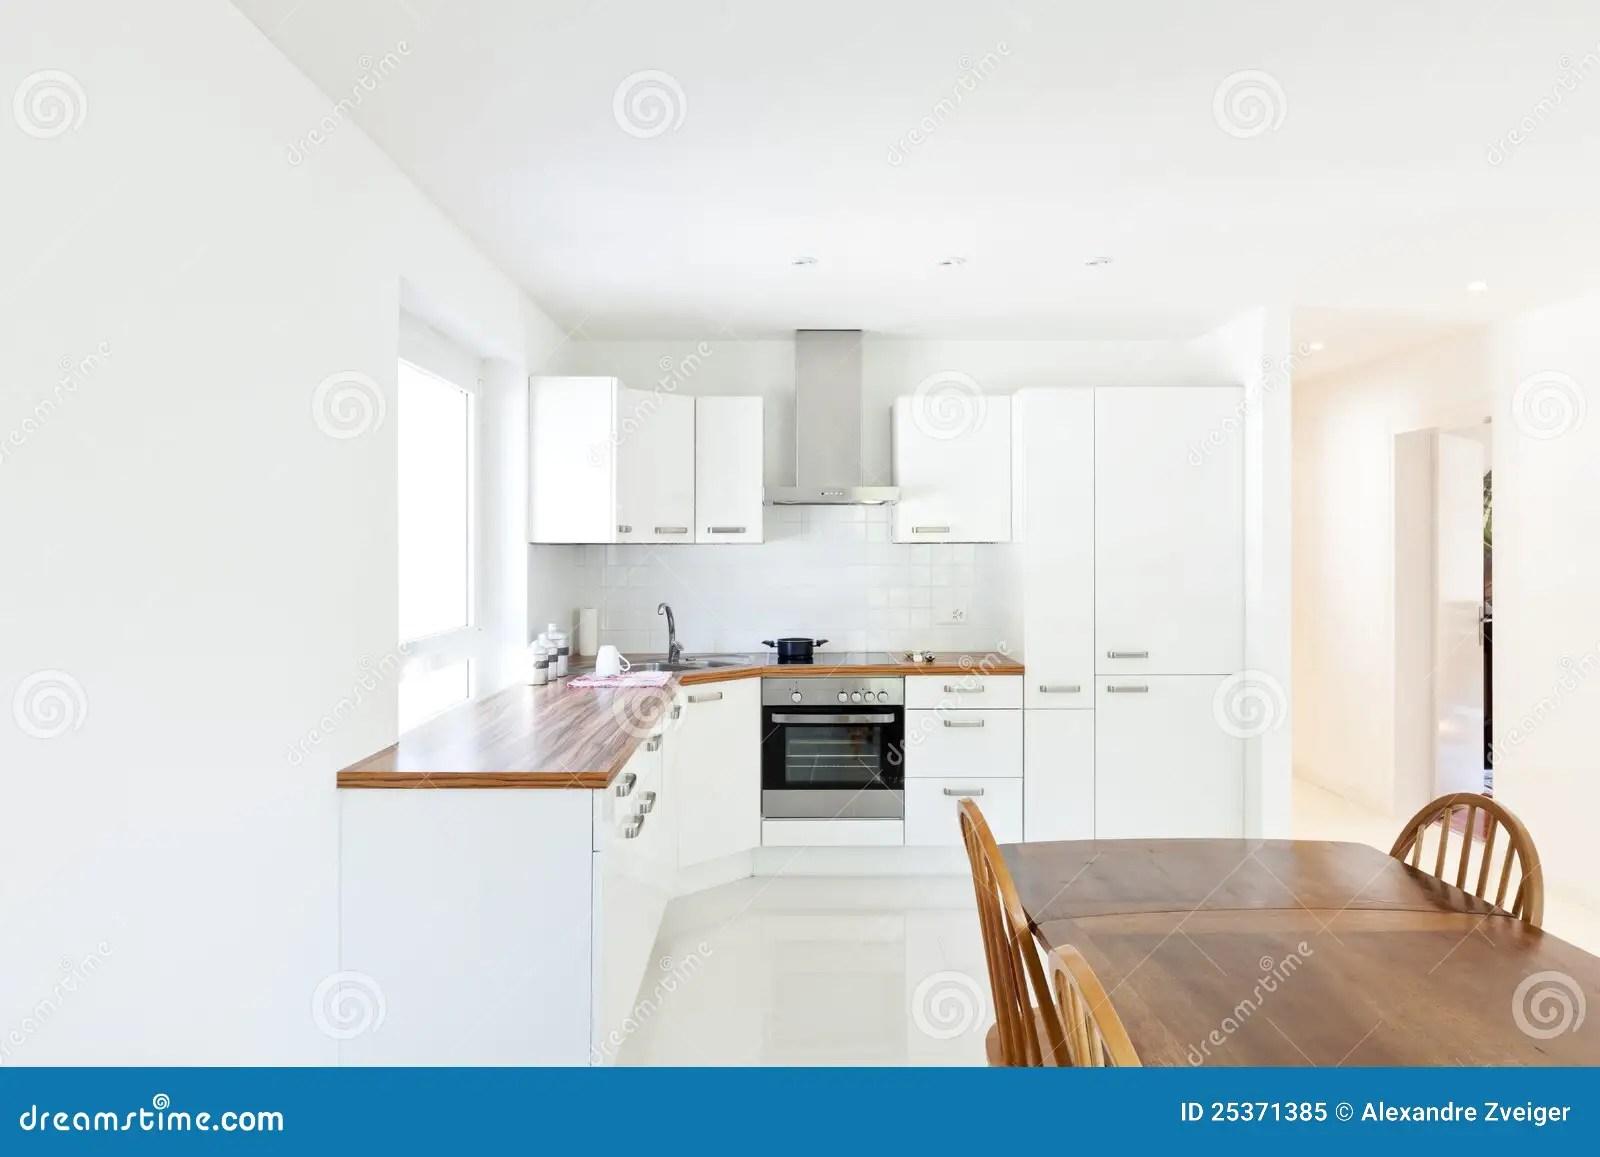 Smalle tafel ikea. top deze witte glivarp tafel with smalle tafel